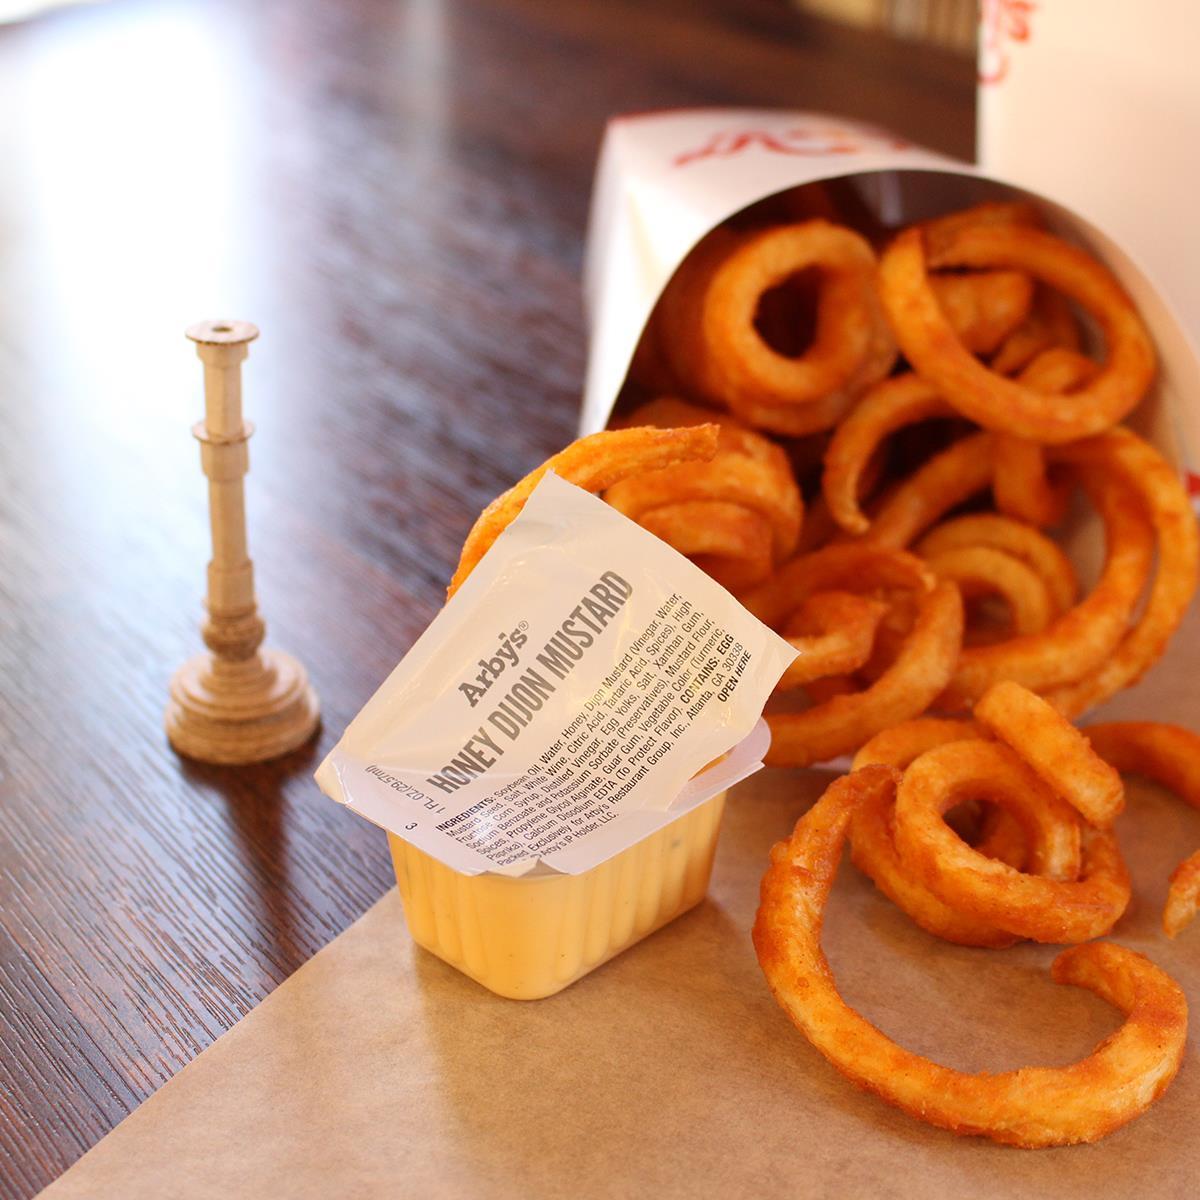 Arby's fries